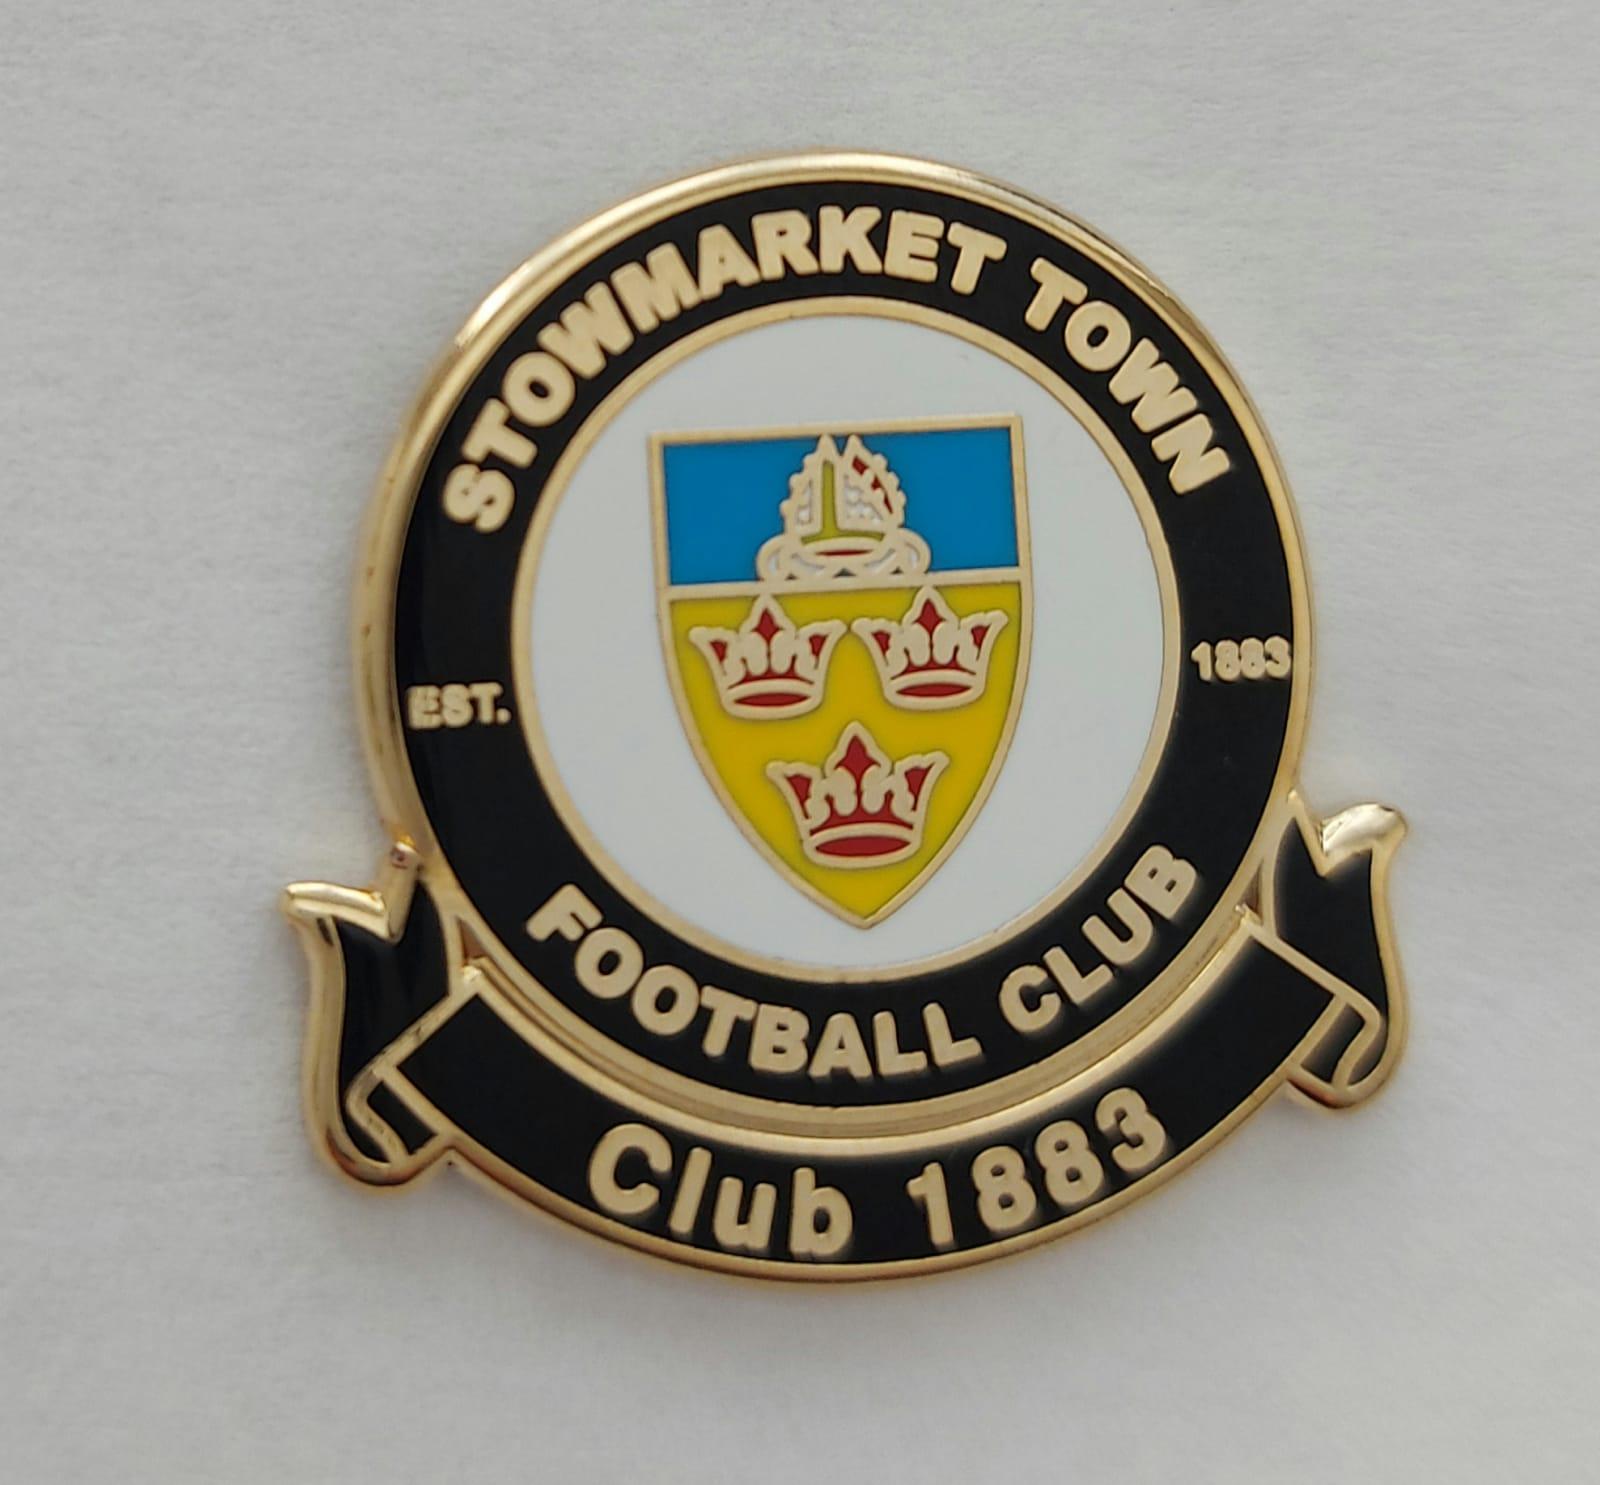 Club 1883 December Draw